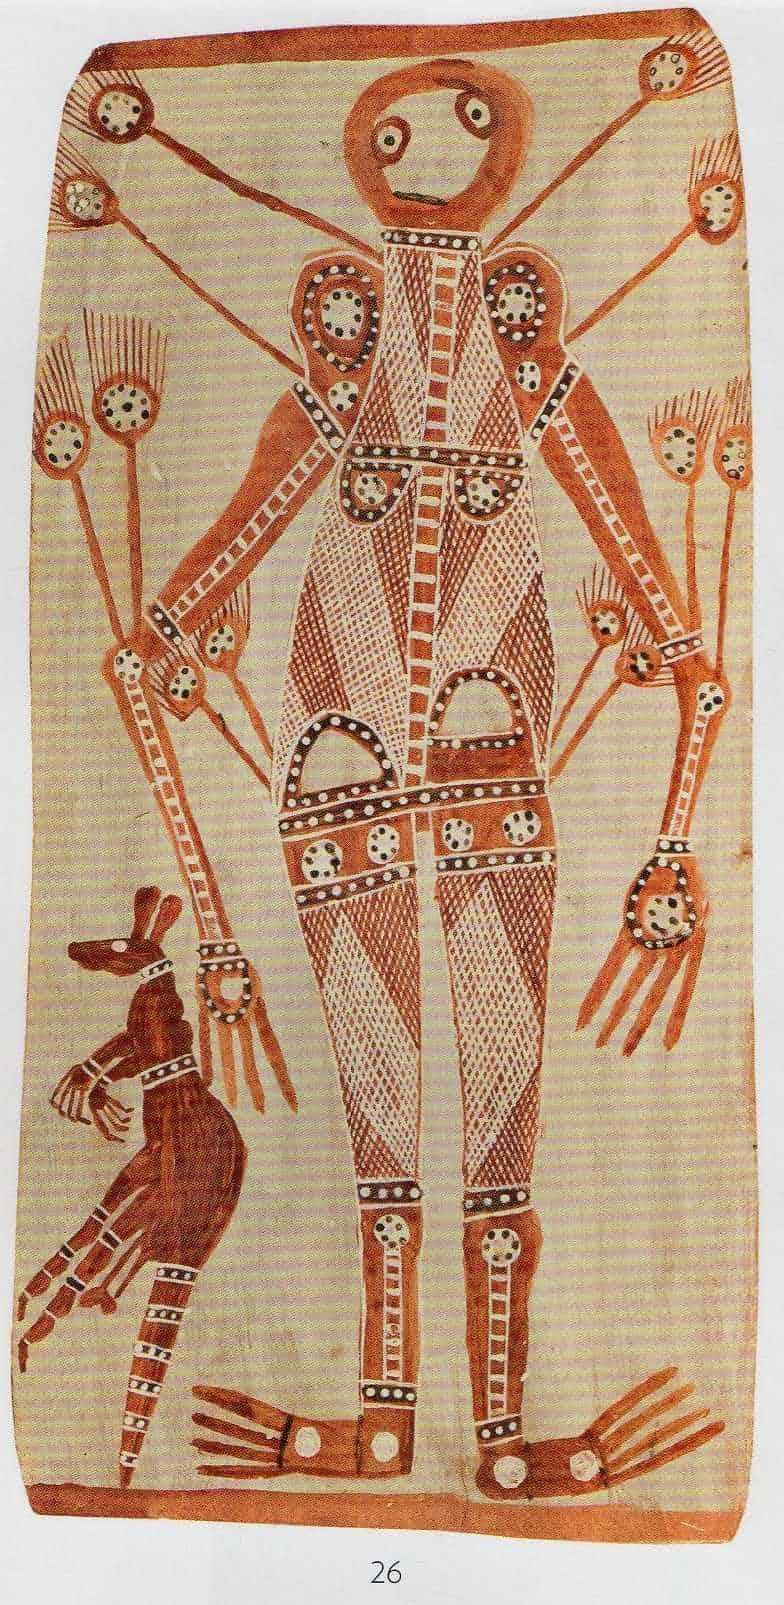 Yirrawala